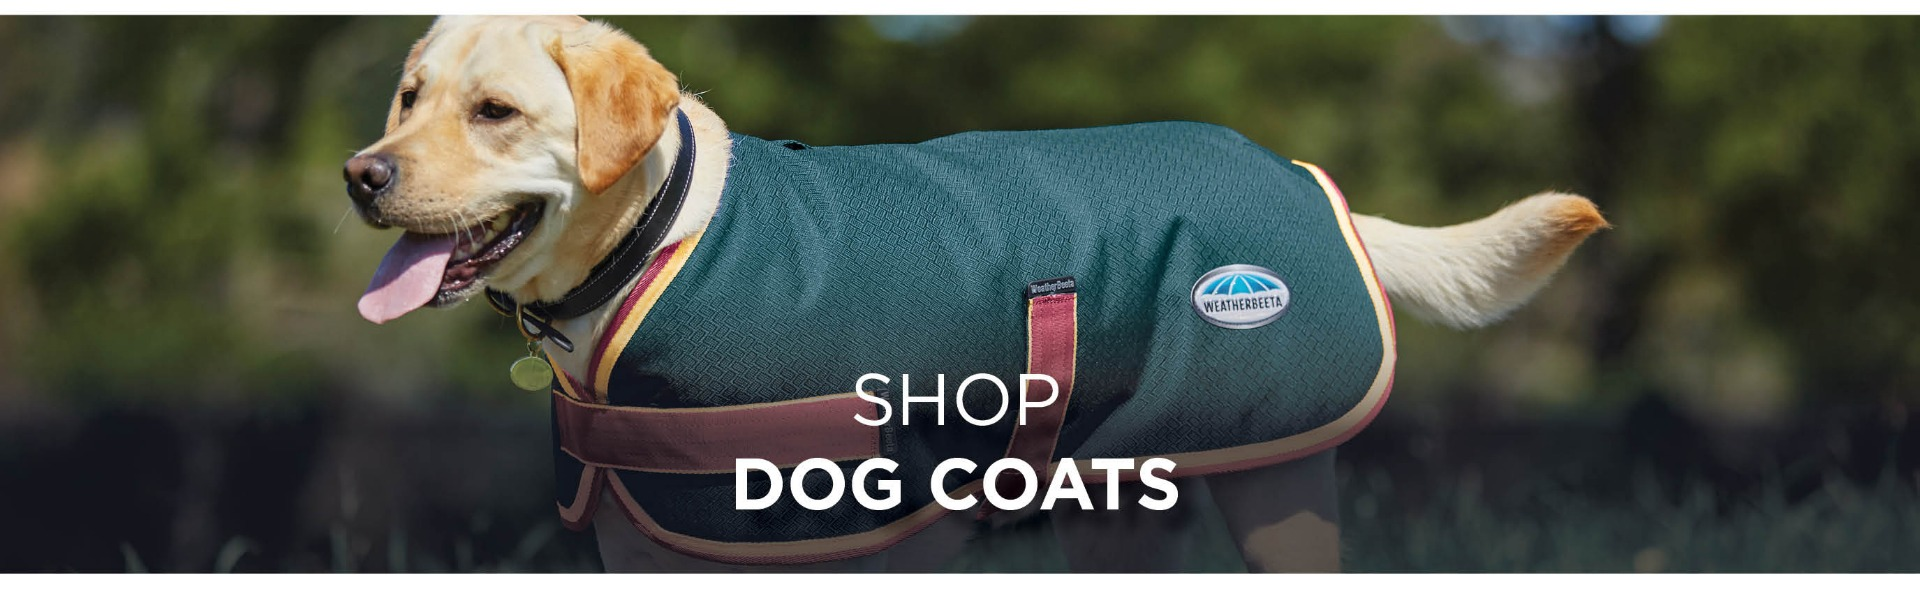 Shop WeatherBeeta Dog Coats